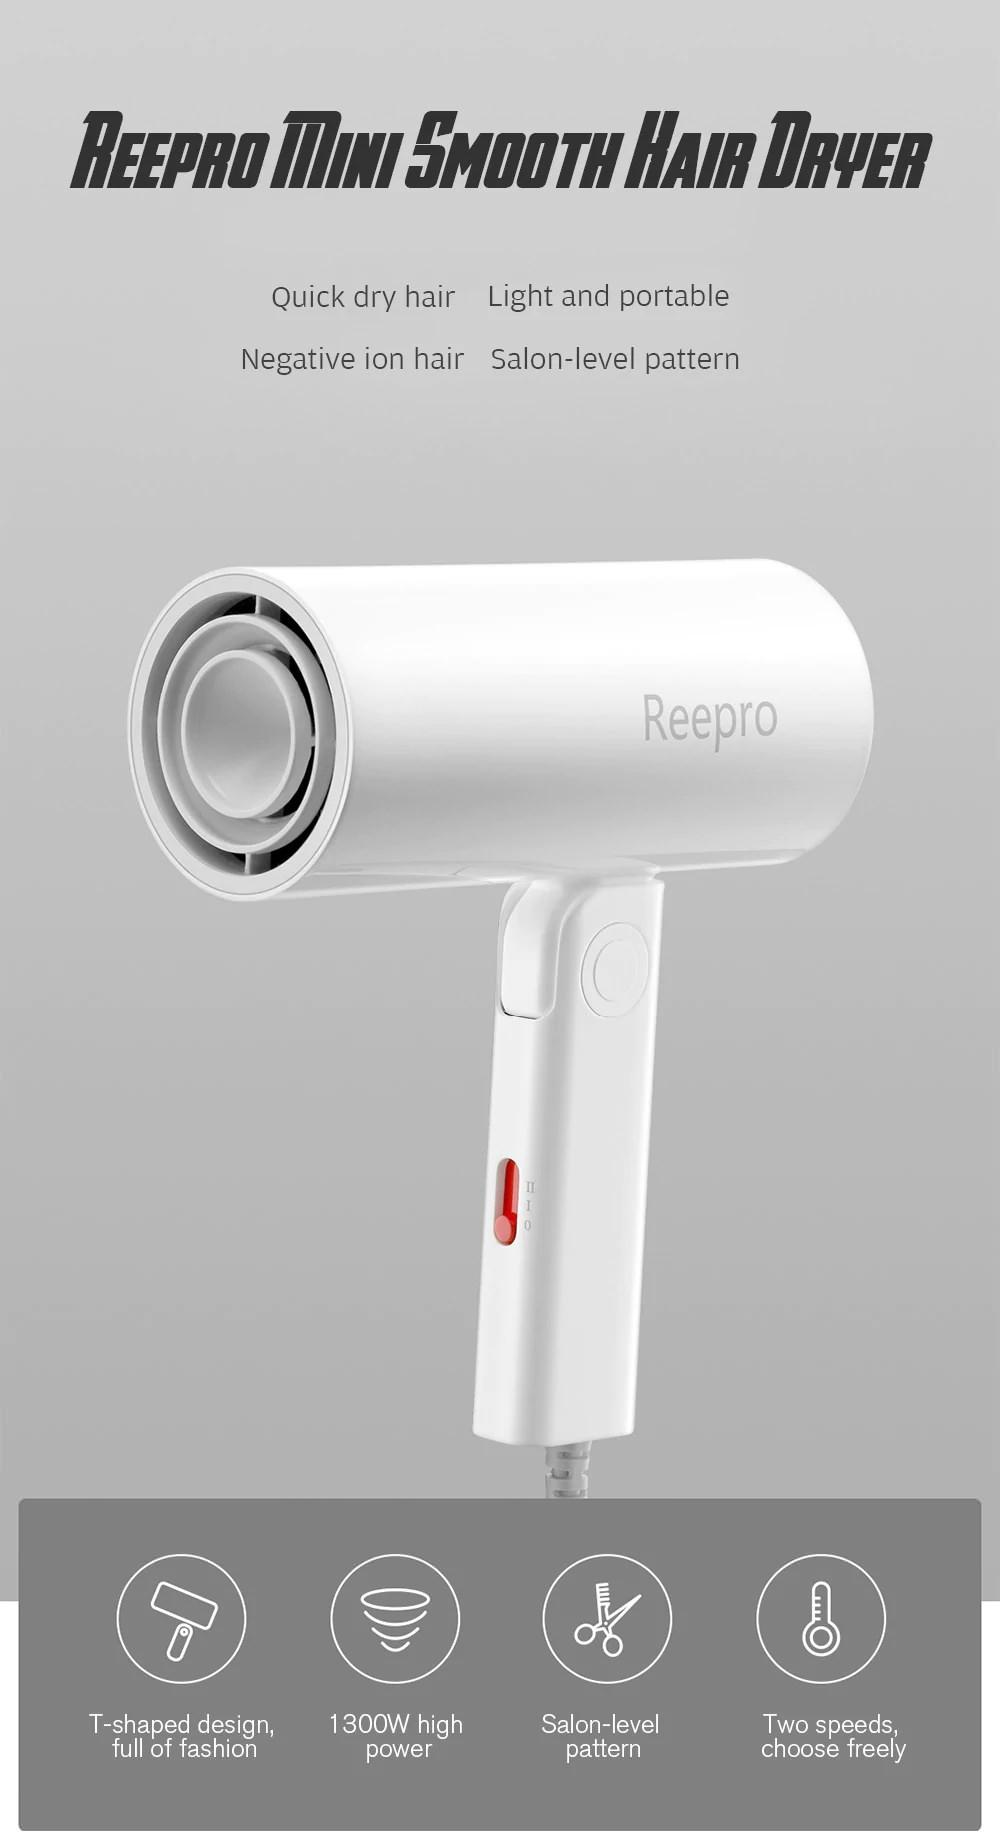 xiaomi reepro rp-hc04 mini hair dryer